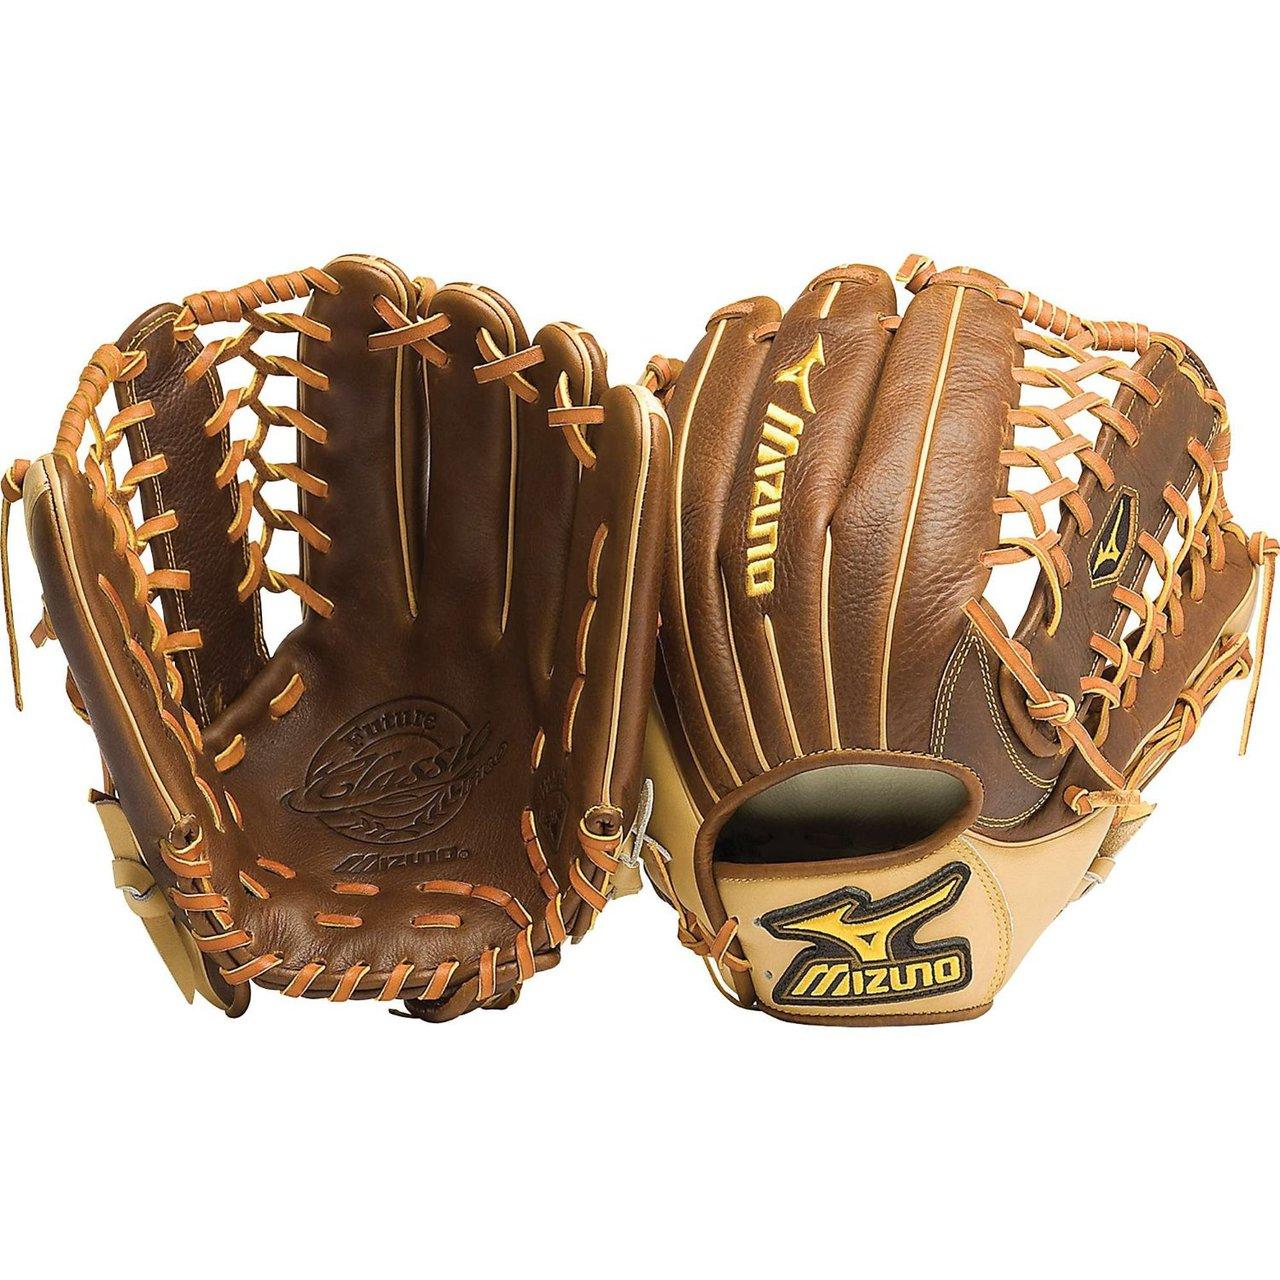 mizuno-classic-pro-future-gcp70f-baseball-fielders-mitt-1225-inch-left-ha GCP70F-Left Hand Throw Mizuno 041969262184 Mizuno Classic Pro Future GCP70F Infielder Glove Small Hand